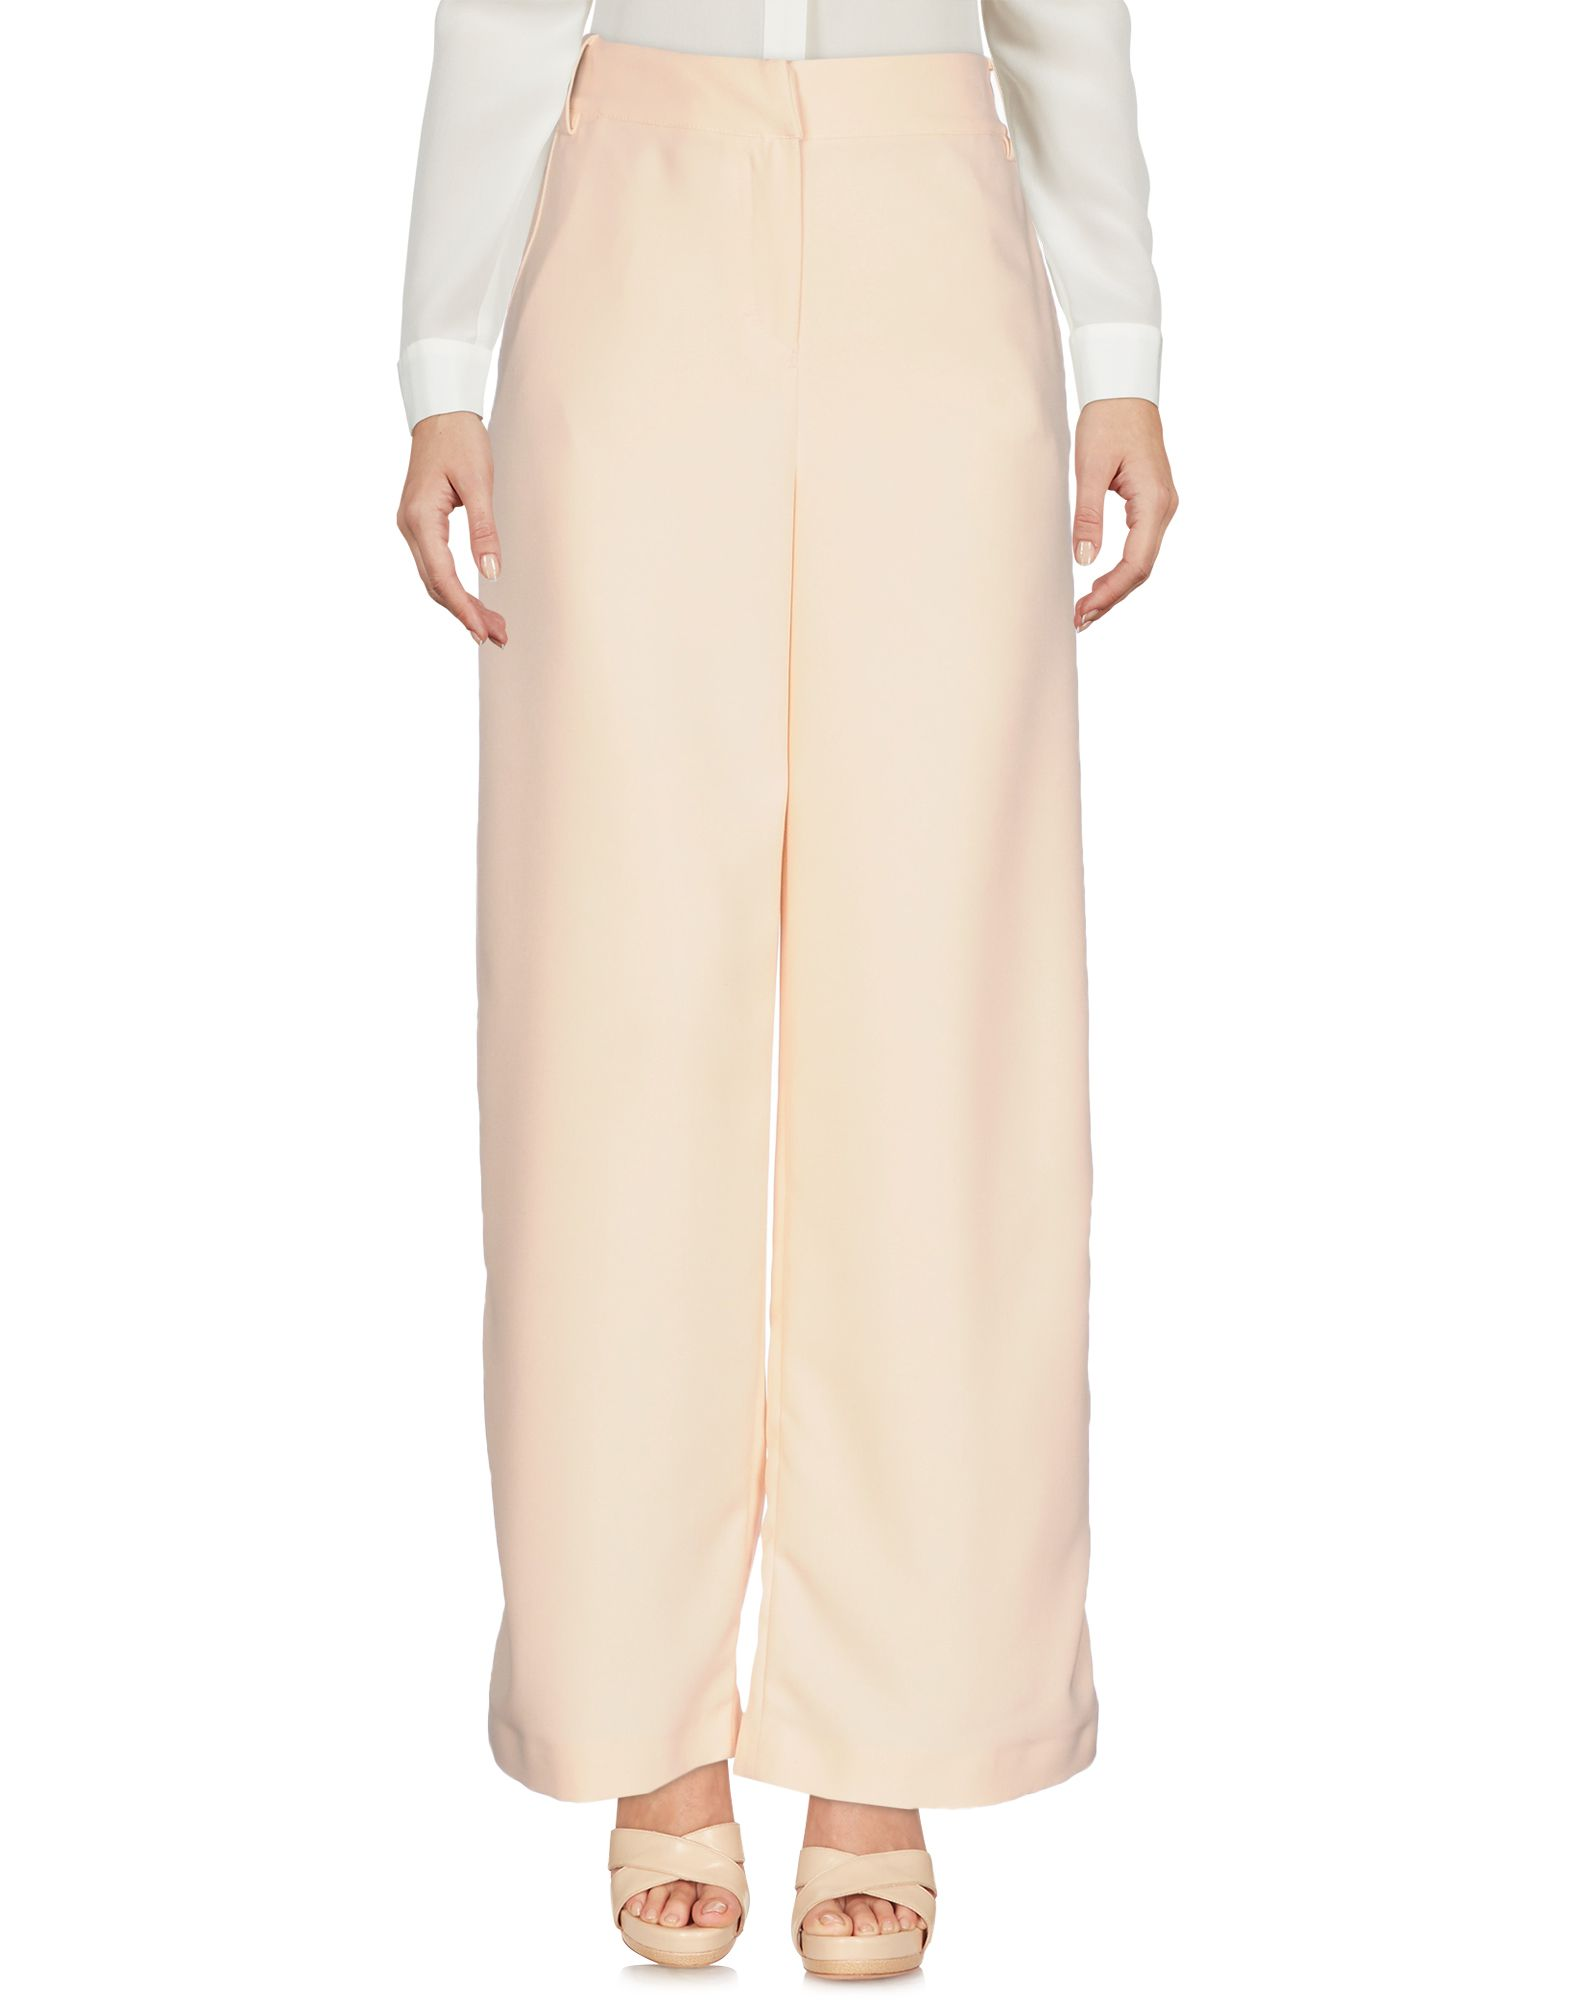 ATOS LOMBARDINI Damen Hose Farbe Hellrosa Größe 3